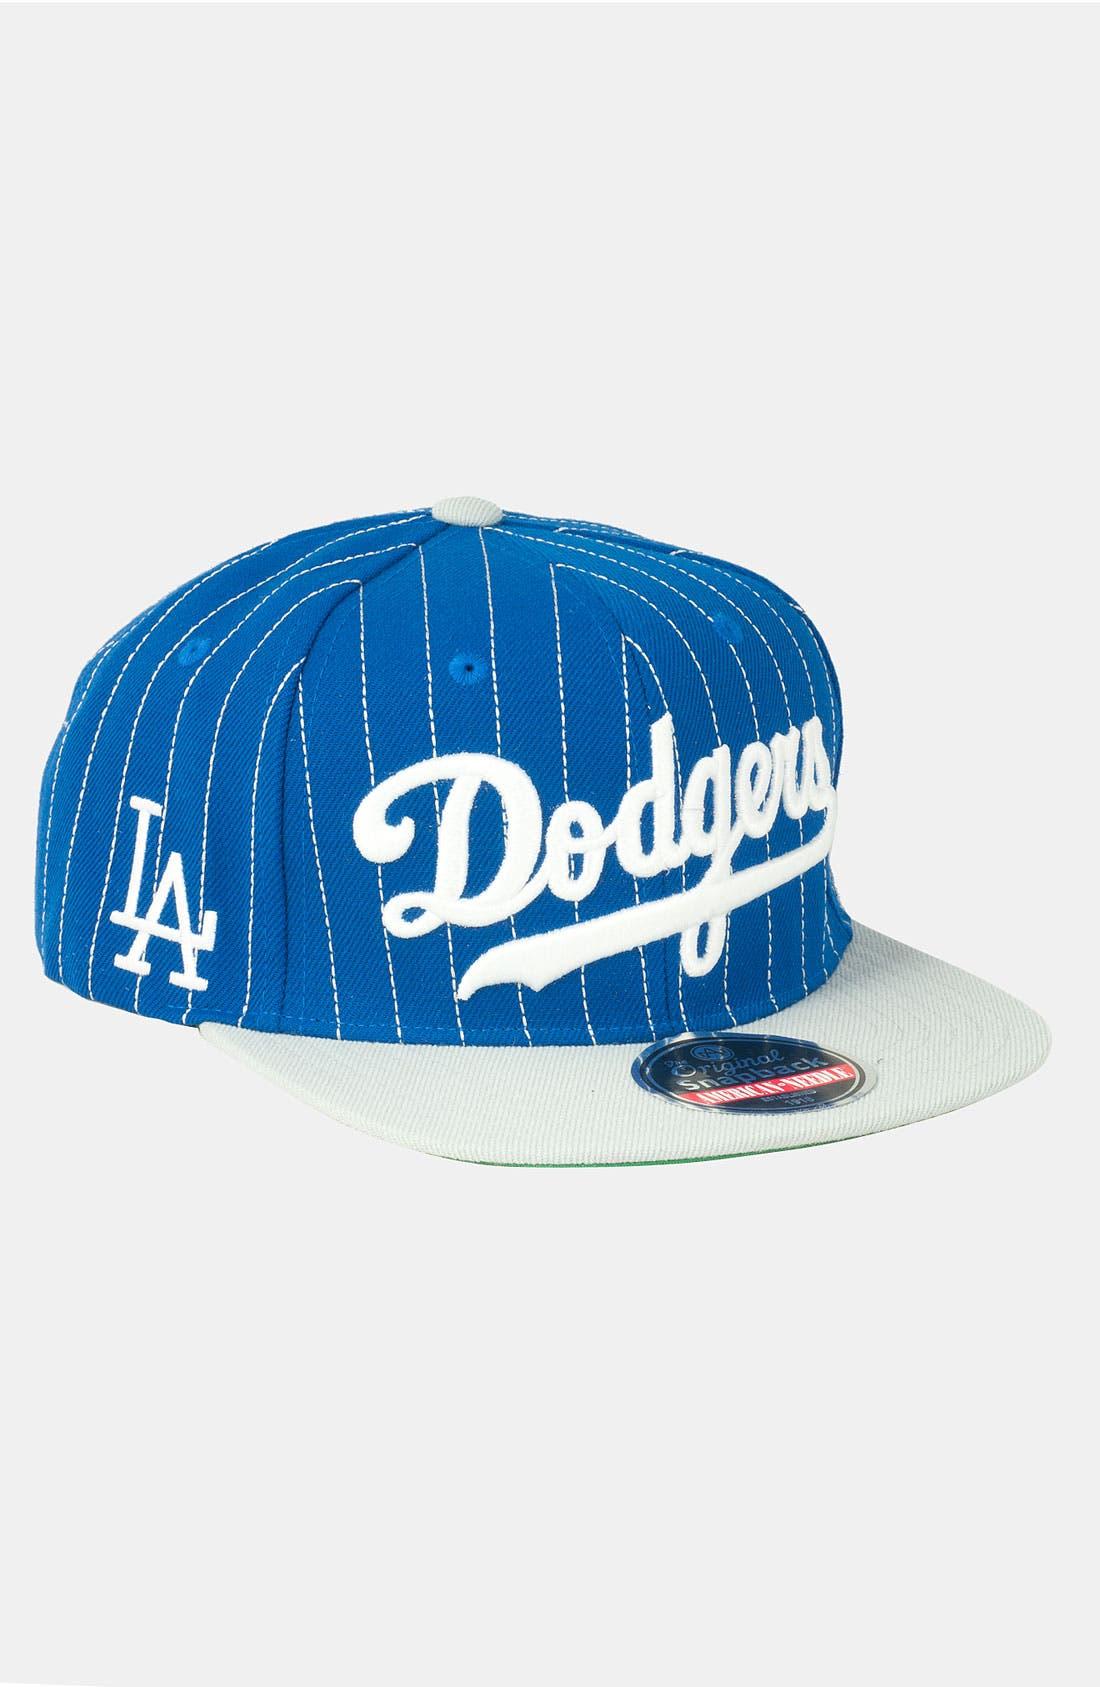 Main Image - American Needle 'Dodgers' Snapback Baseball Cap